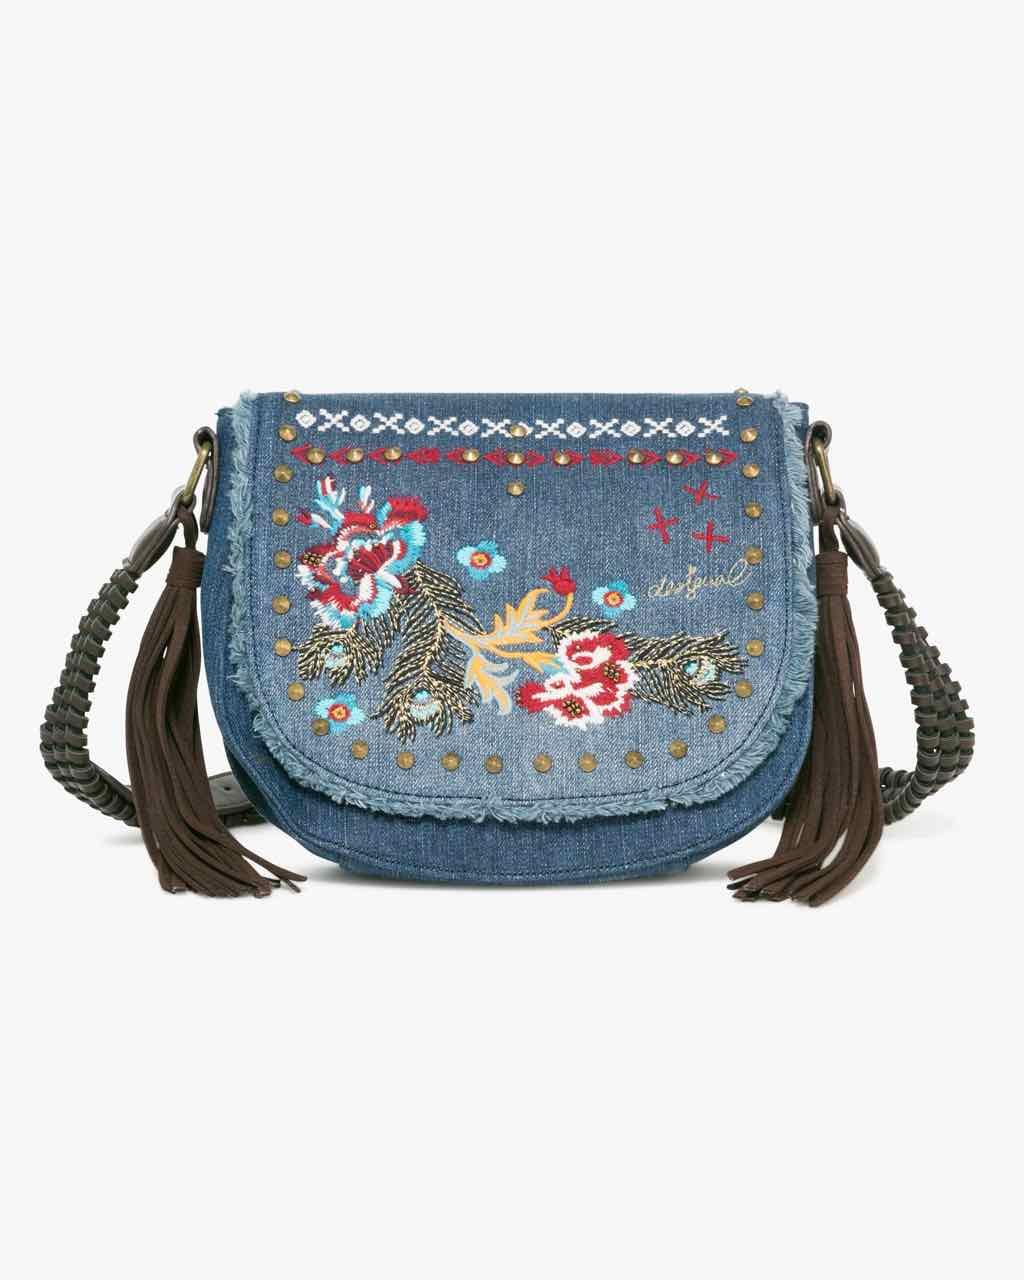 17WAXDCJ_5006 Desigual Bag Varsovia Jade Buy Online